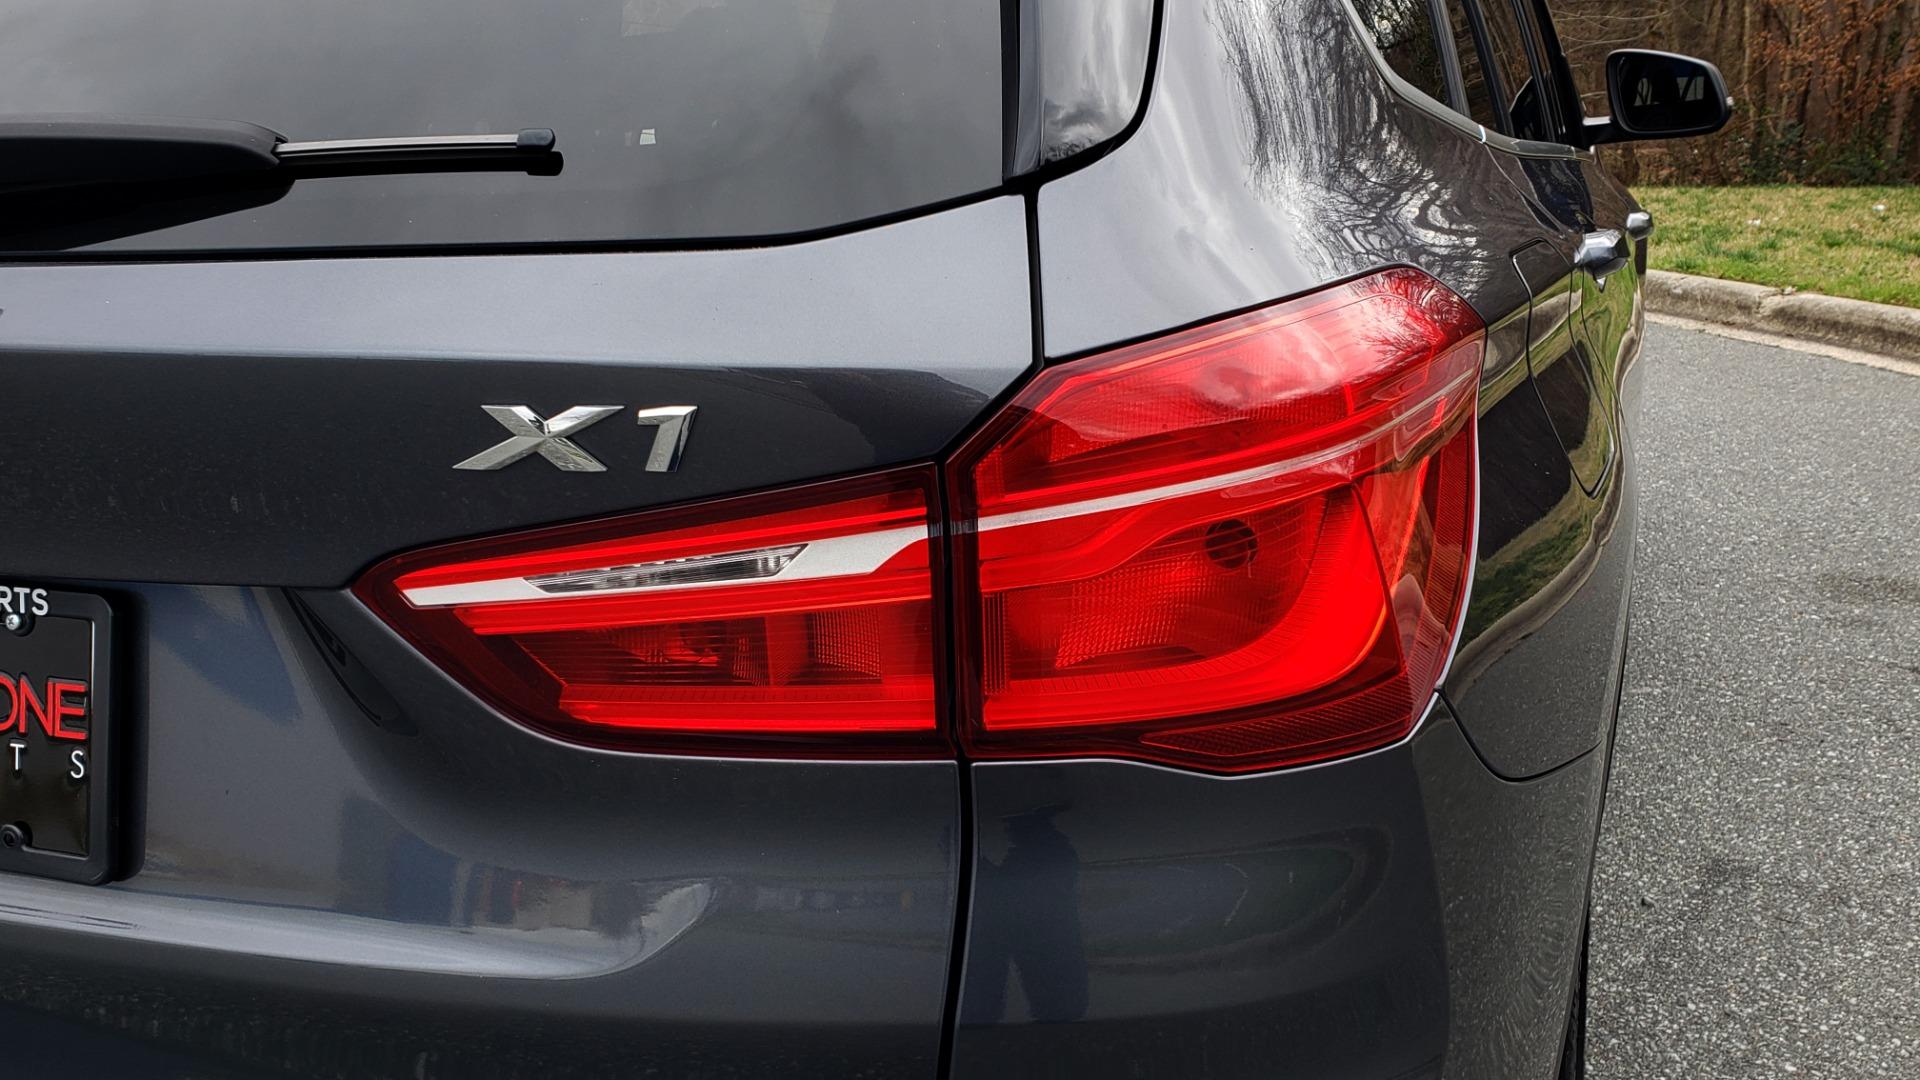 Used 2017 BMW X1 XDRIVE28I / PREM PKG / DRIVER ASST / NAV / CLD WTHR for sale Sold at Formula Imports in Charlotte NC 28227 31